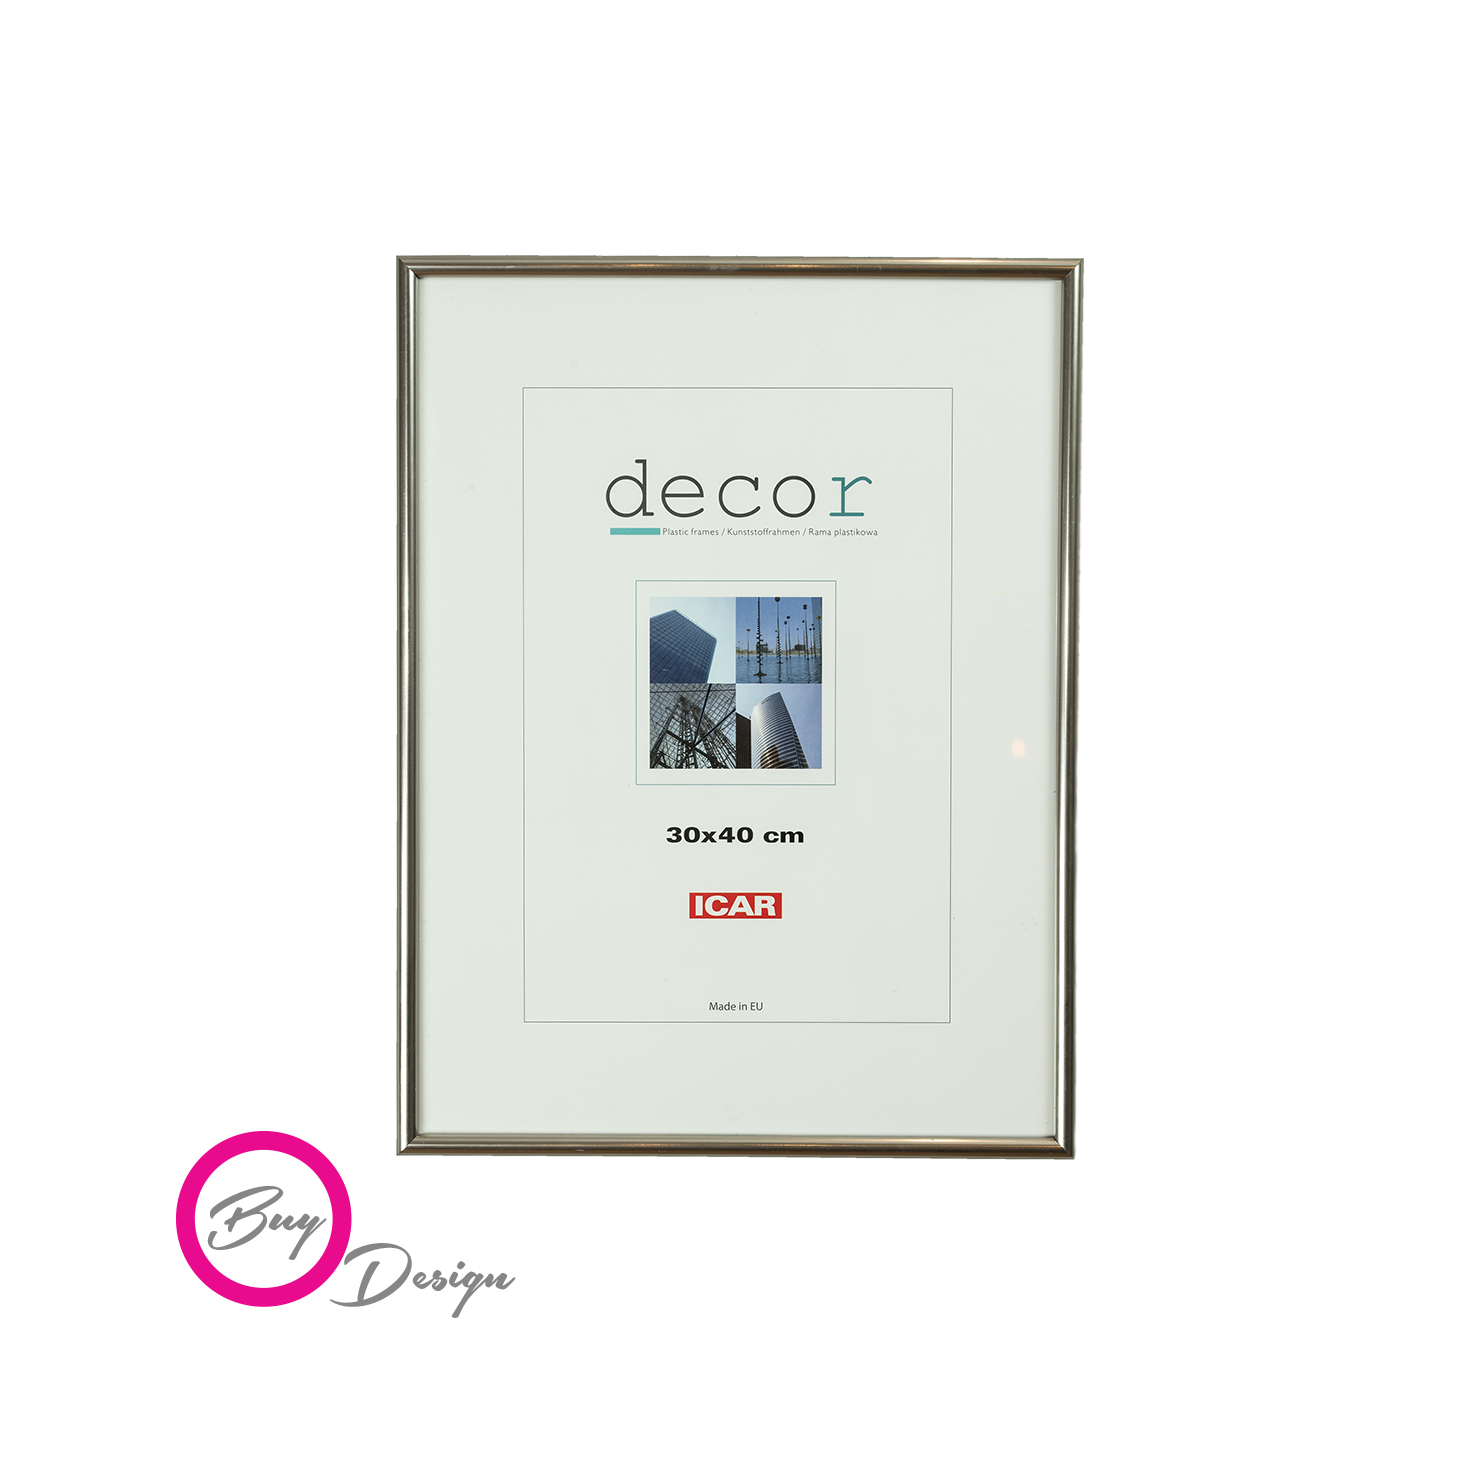 Rama metalizowana DECOR C ST 30x40 - Buy Design